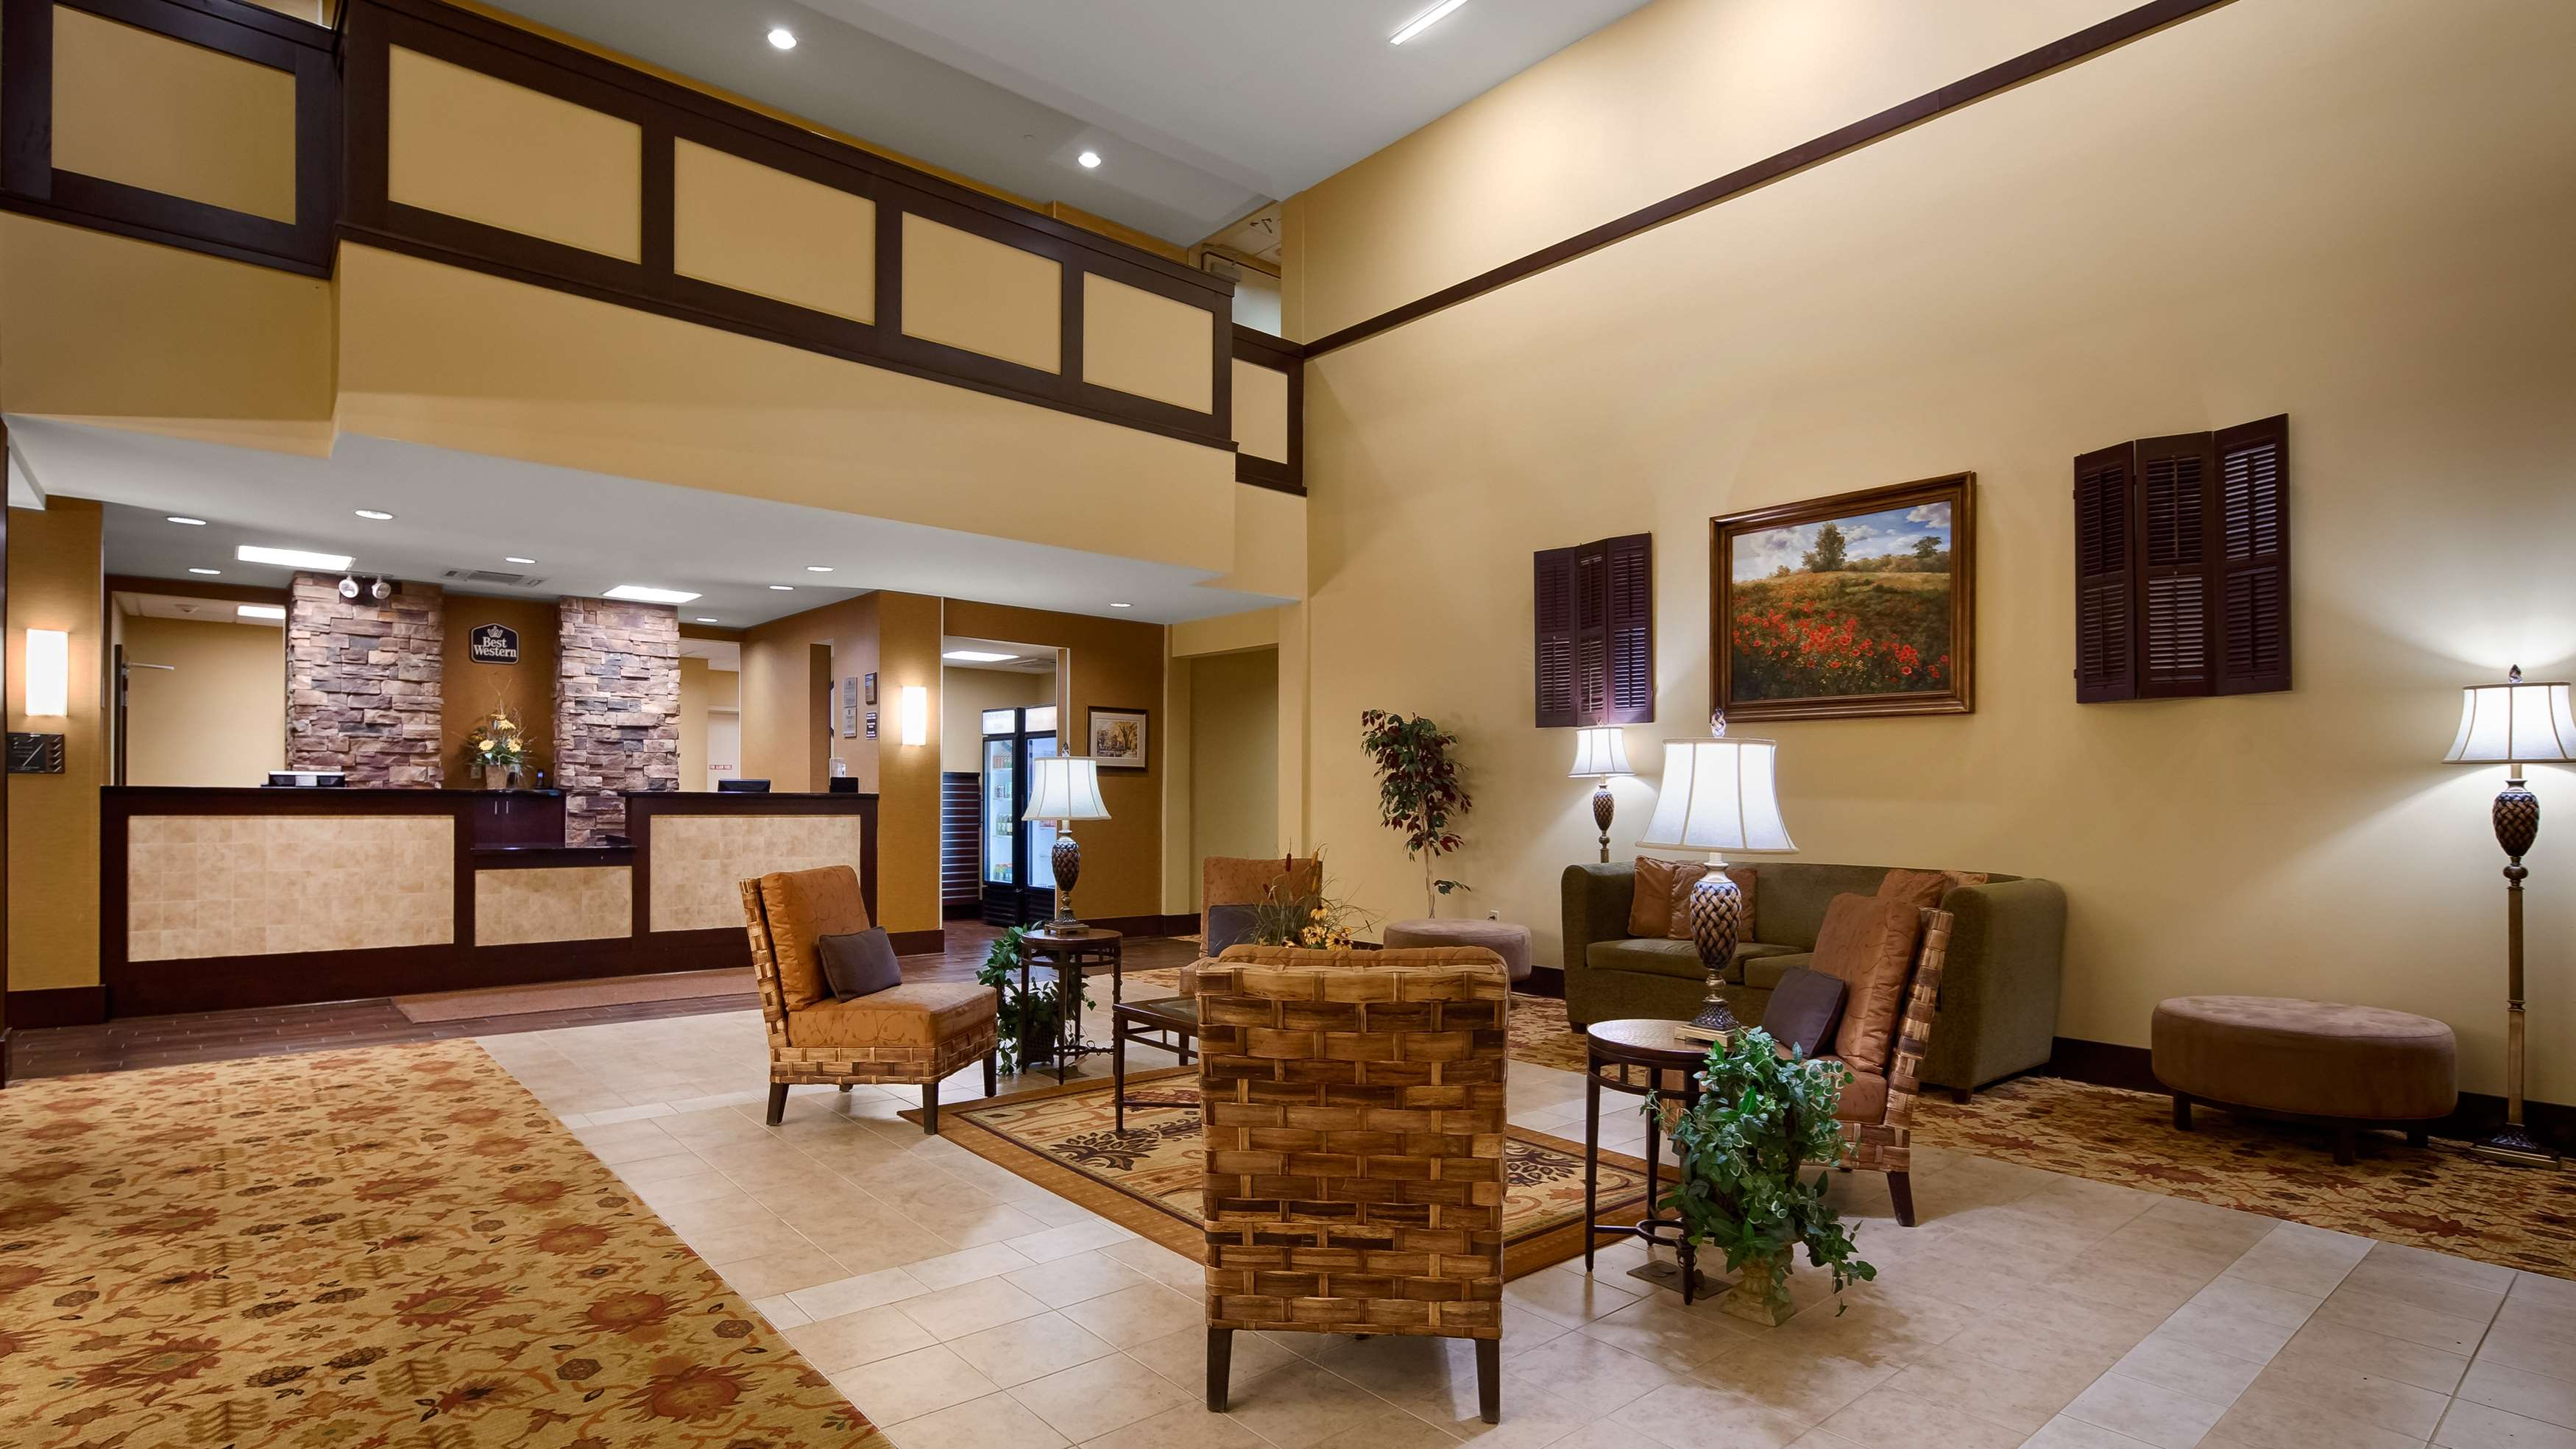 Best Western Plus University Park Inn & Suites image 4